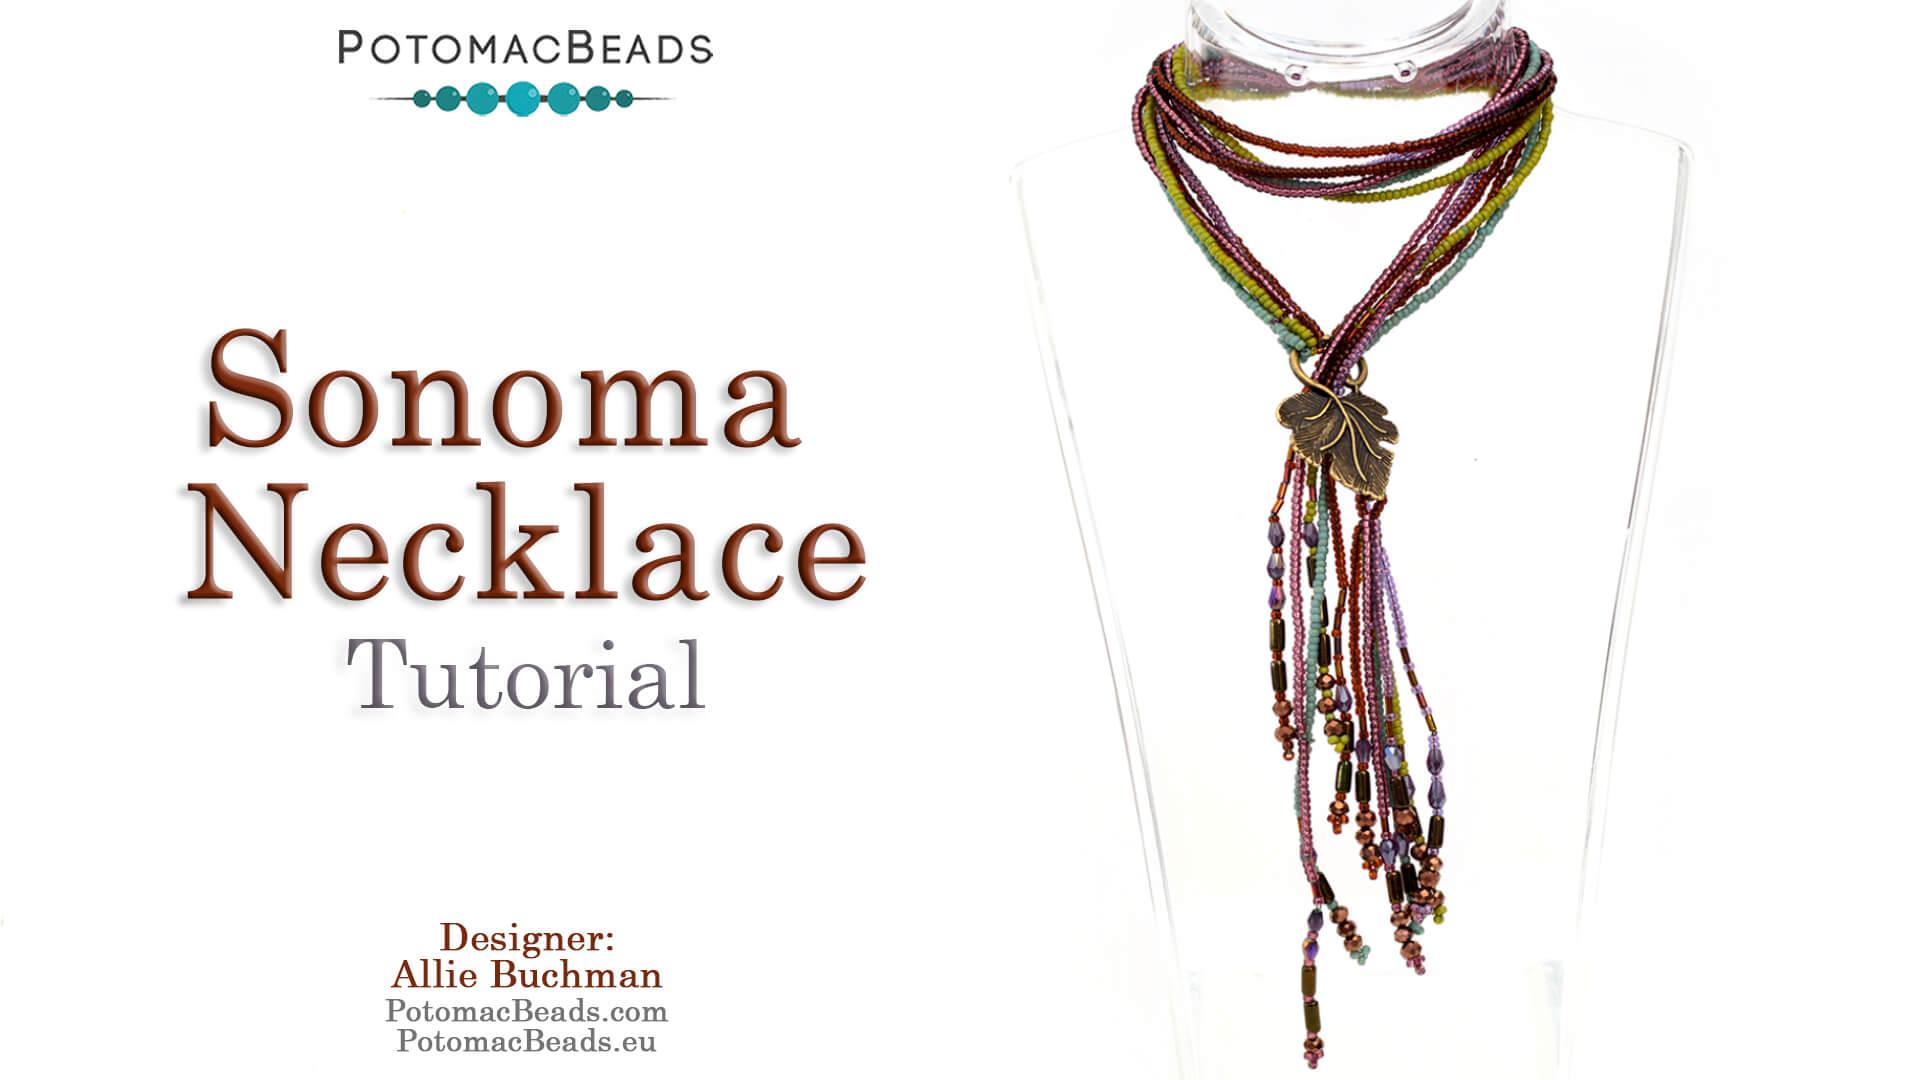 How to Bead Jewelry / Beading Tutorials & Jewel Making Videos / Bead Weaving Tutorials & Necklace Tutorial / Sonoma Necklace Tutorial